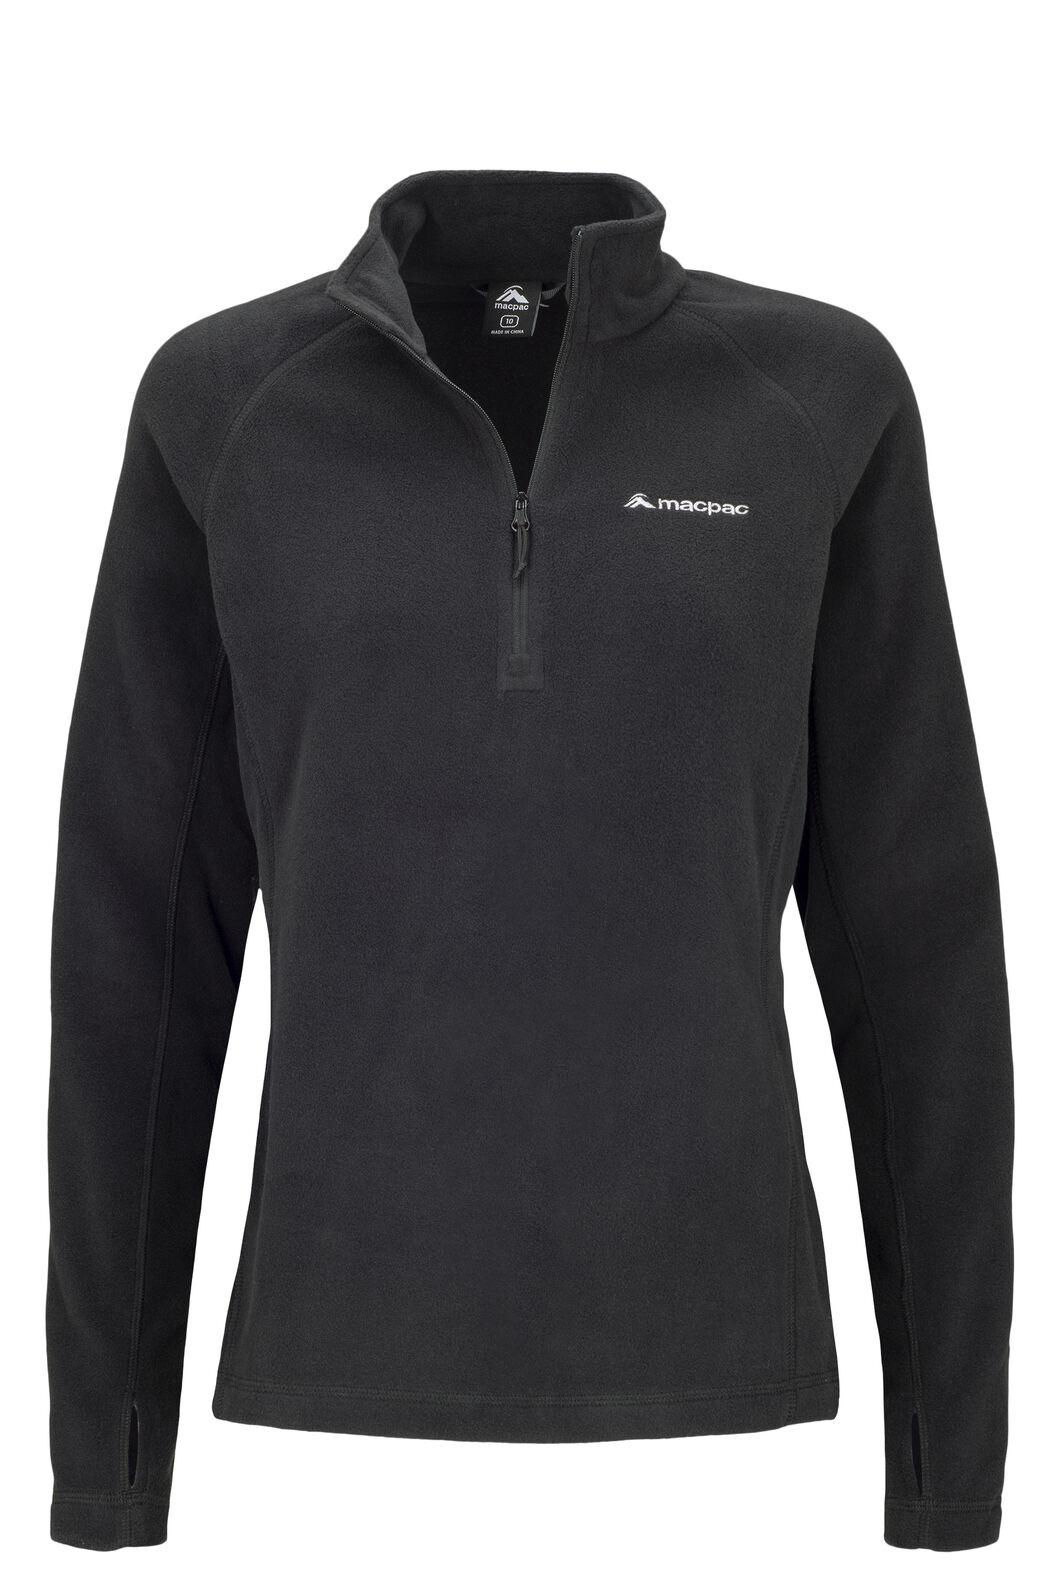 Macpac Women's Tui Polartec® Micro Fleece® Pullover, Black, hi-res